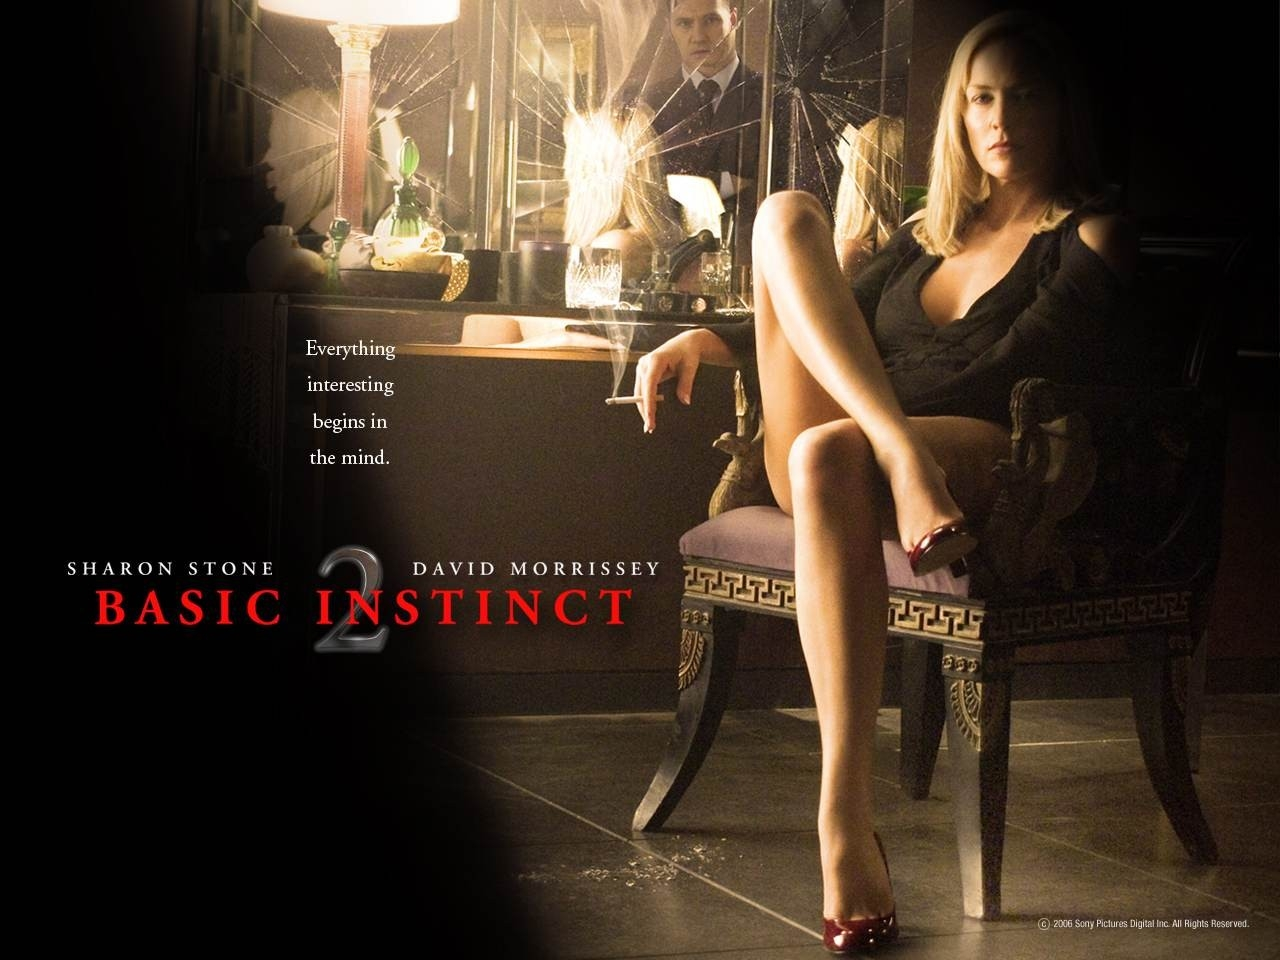 Wallpaper del film Basic Instinct 2 con Sharon Stone